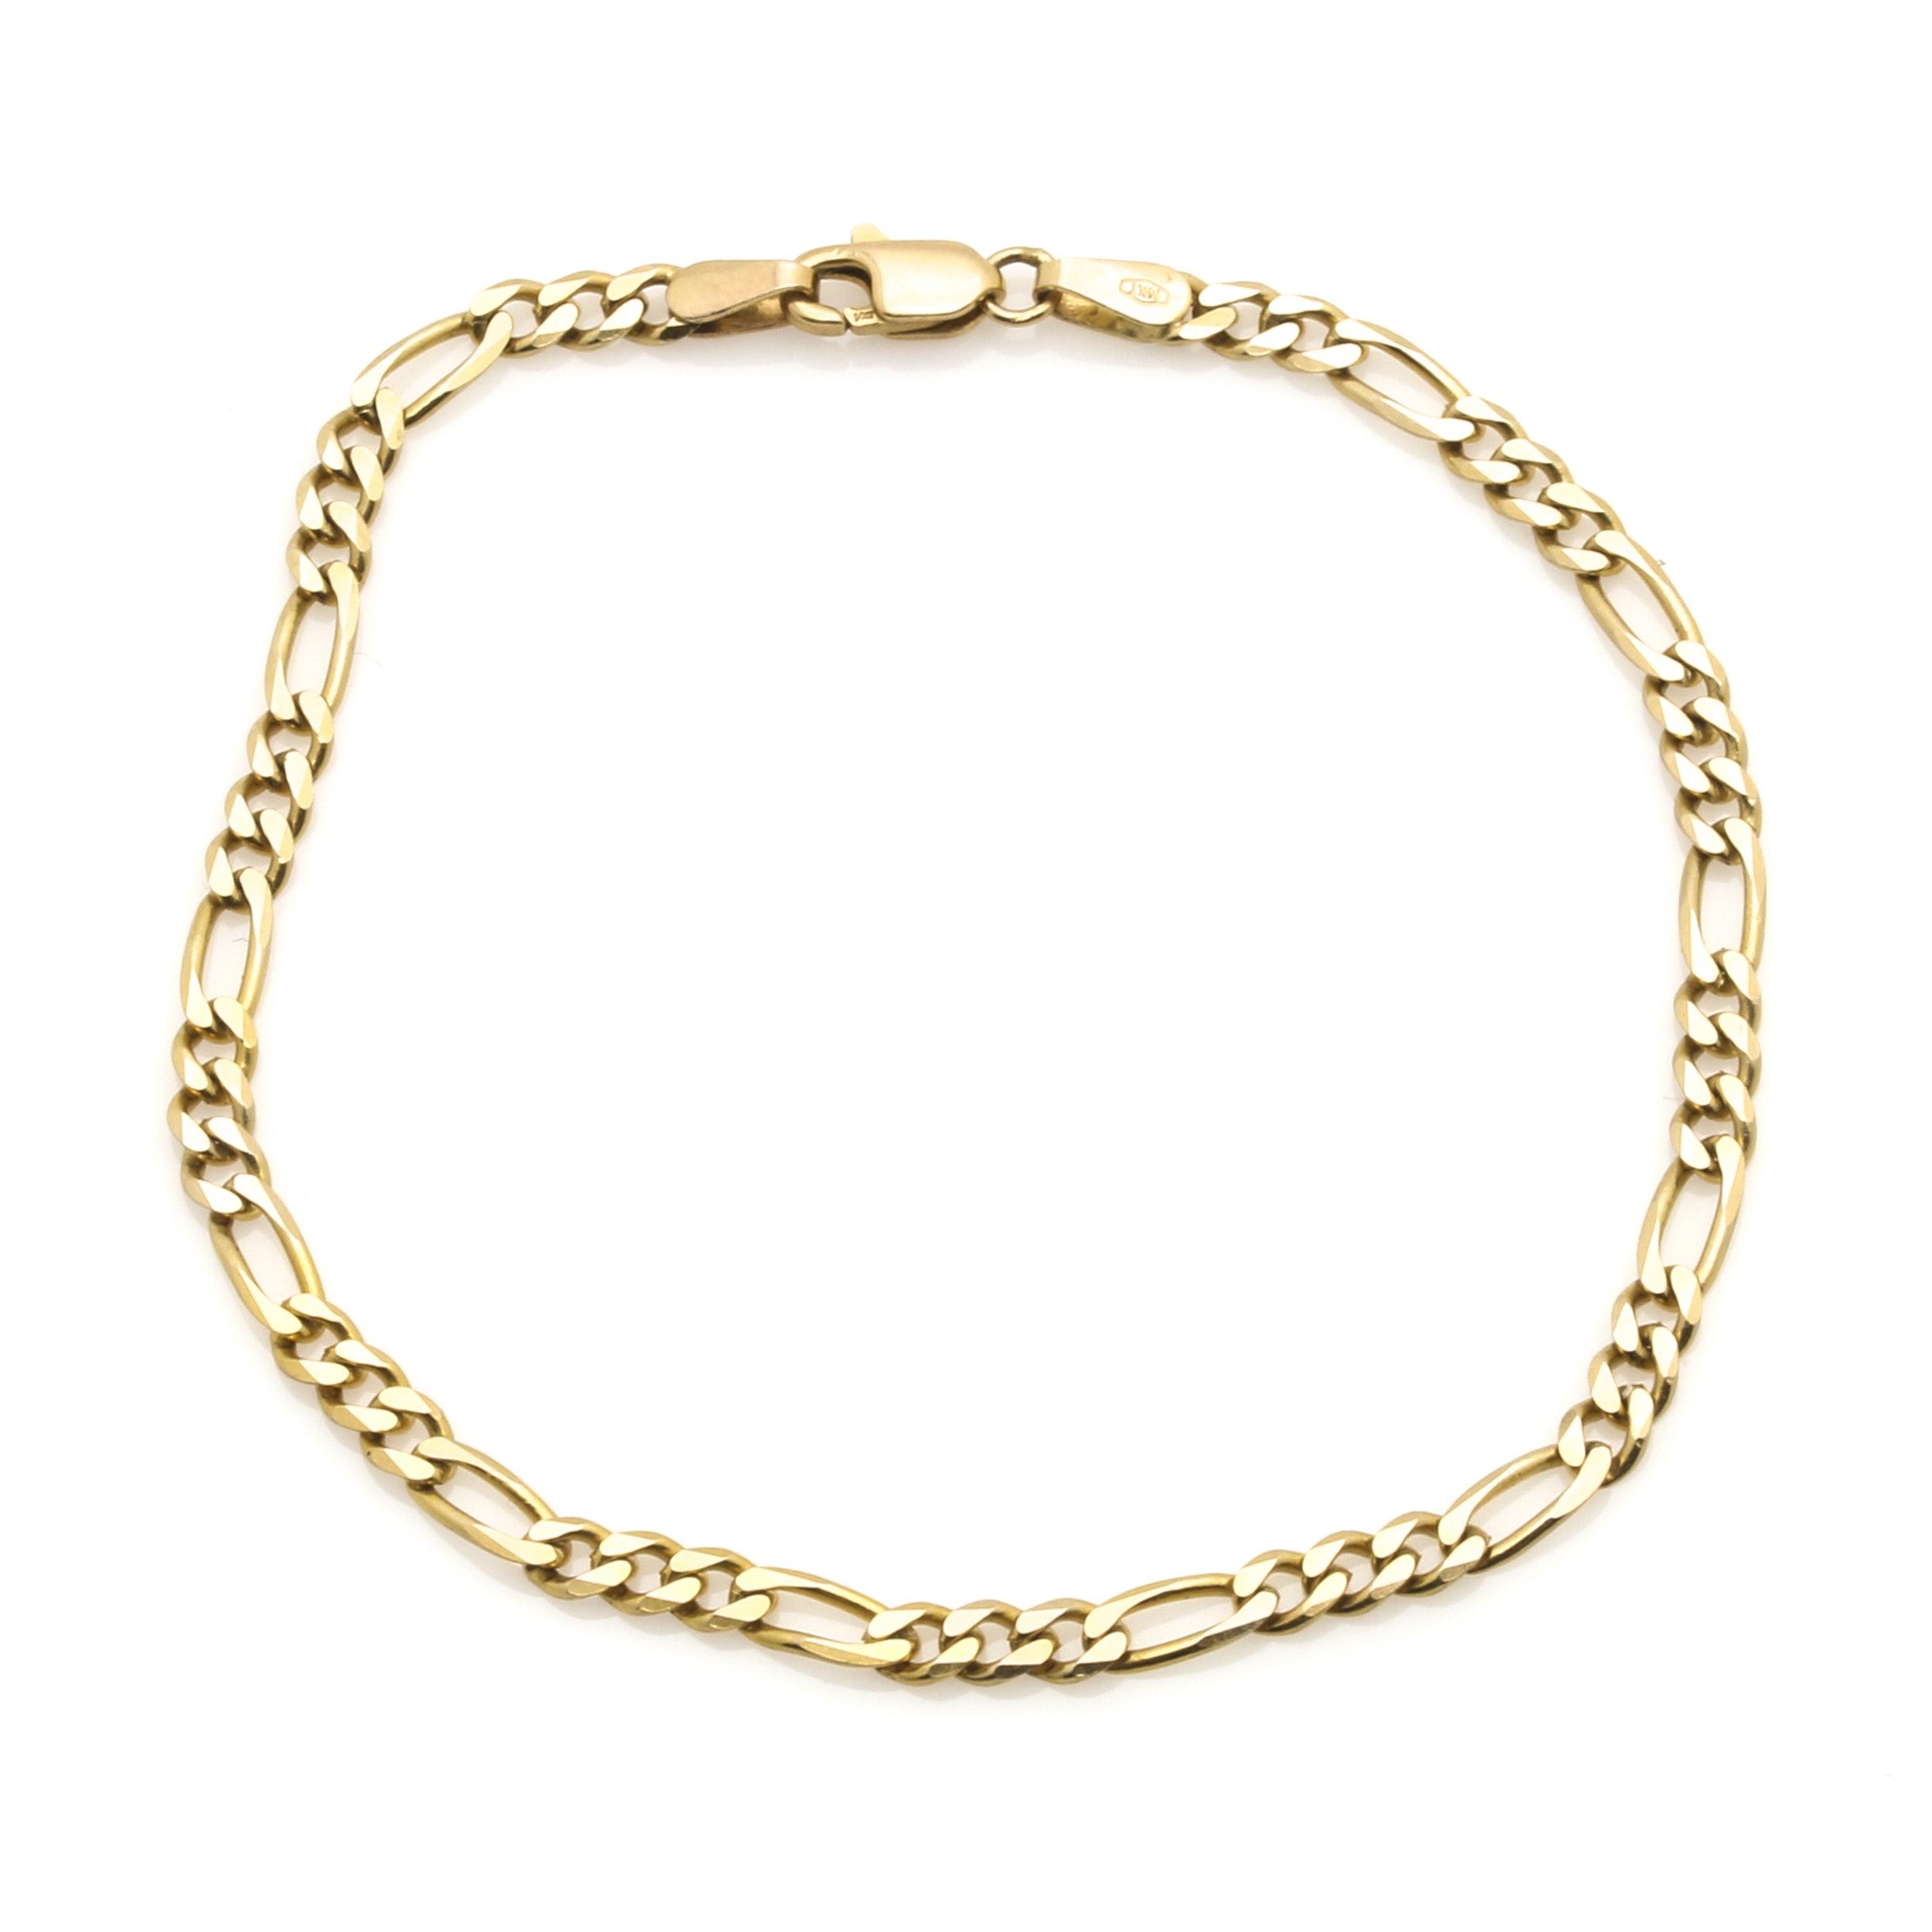 14K Yellow Gold Figaro Chain Bracelet